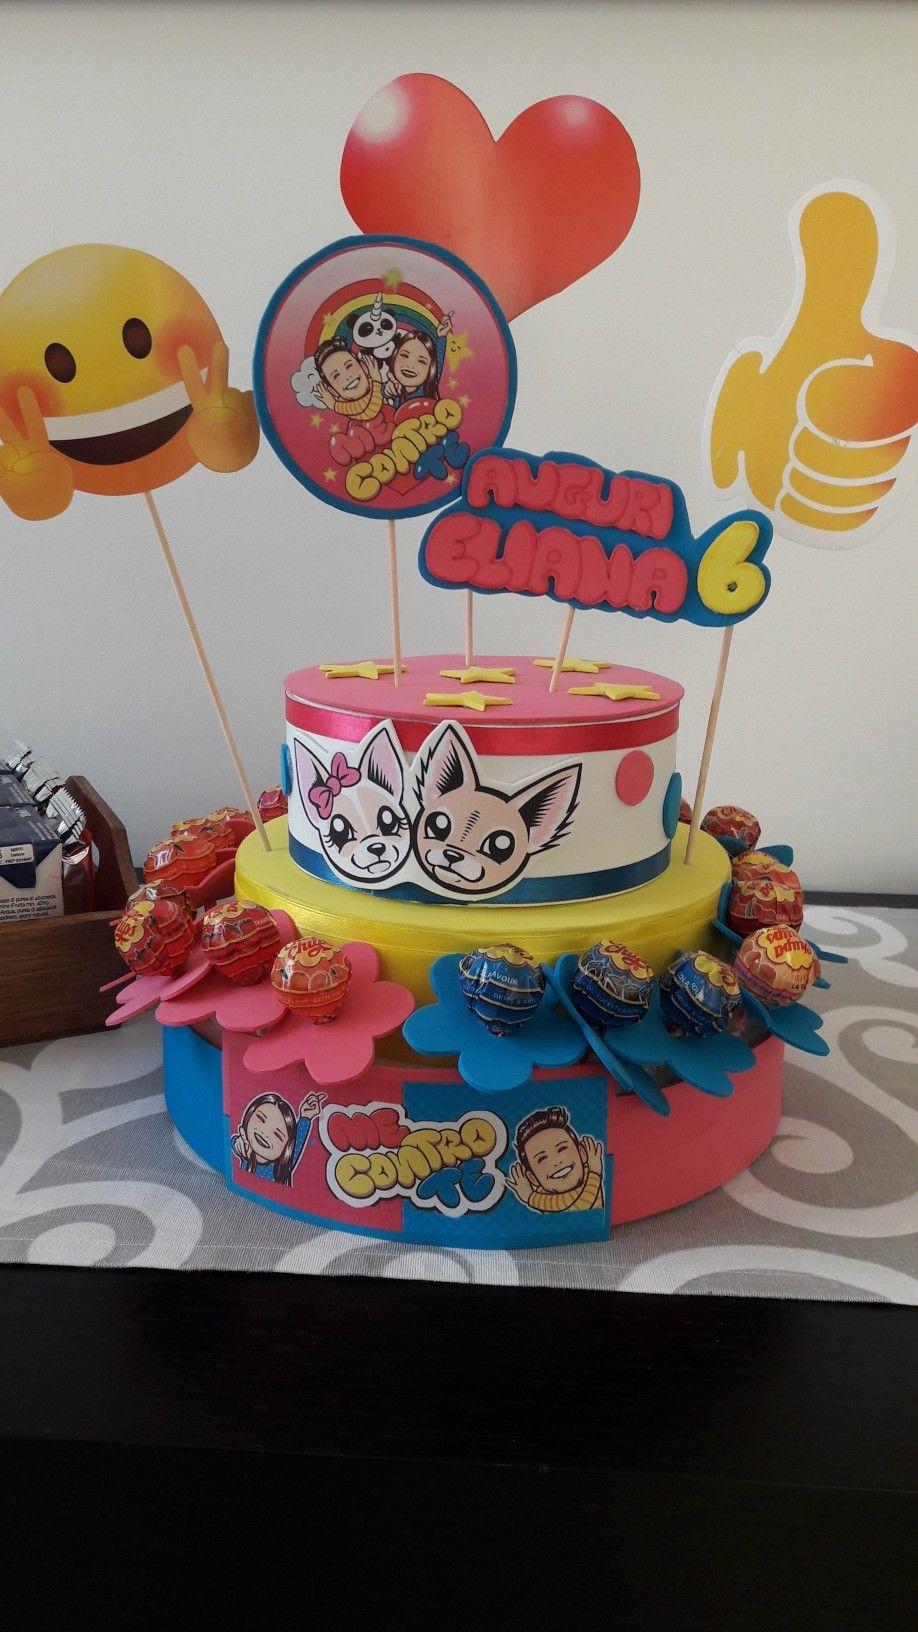 Sofì E Lui Parti Torte Cake Birthday Party